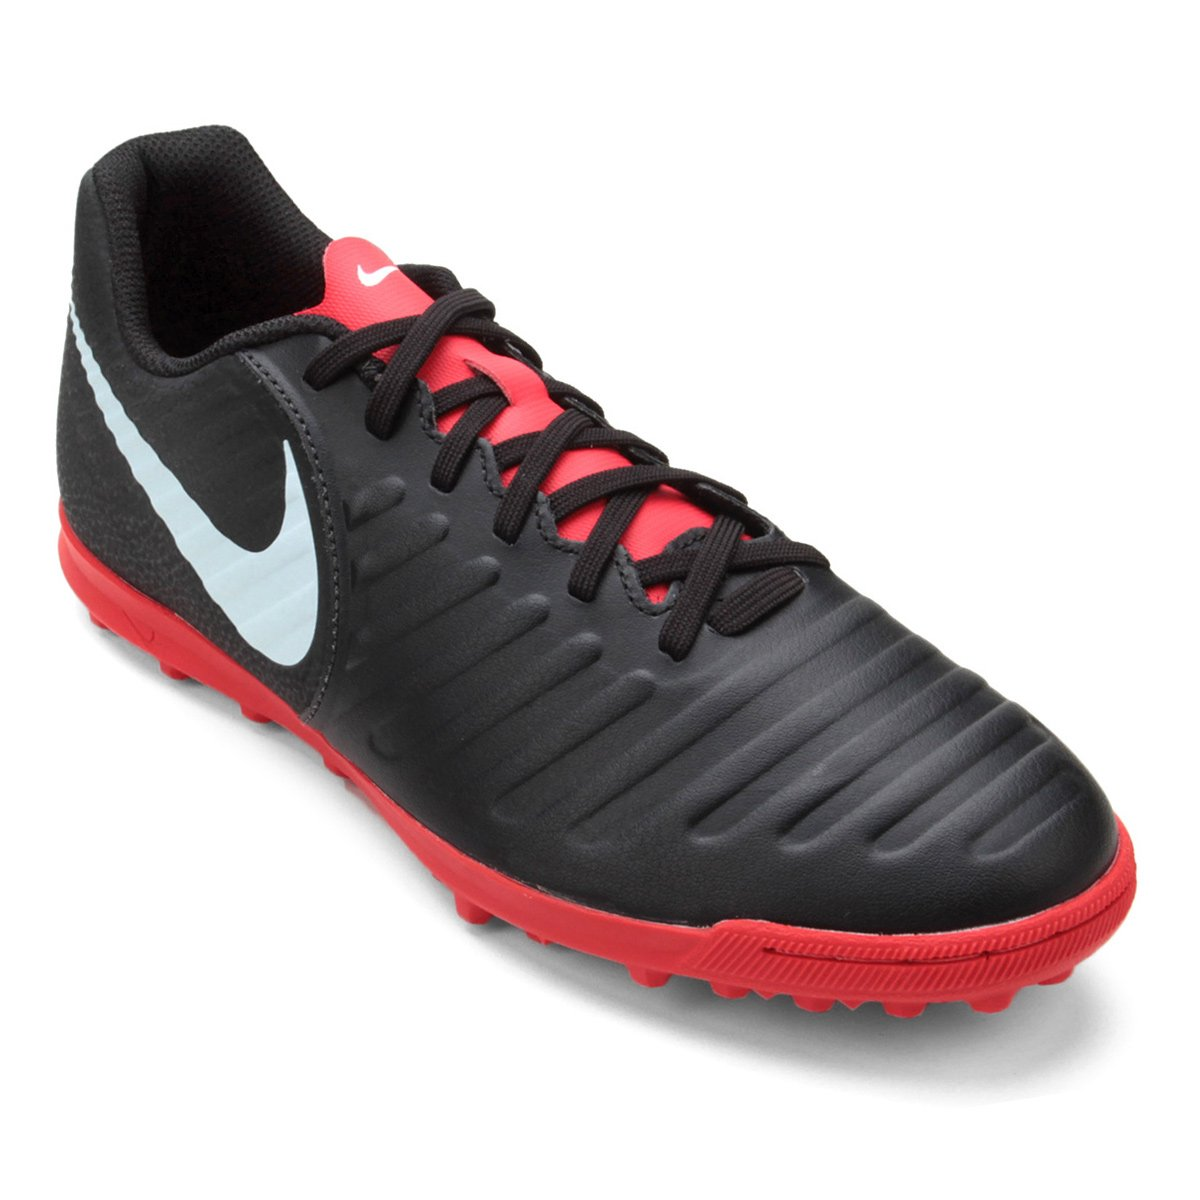 Chuteira Society Nike Tiempo Legend 7 Club TF - Preto - Compre Agora ... 463496f6ef358